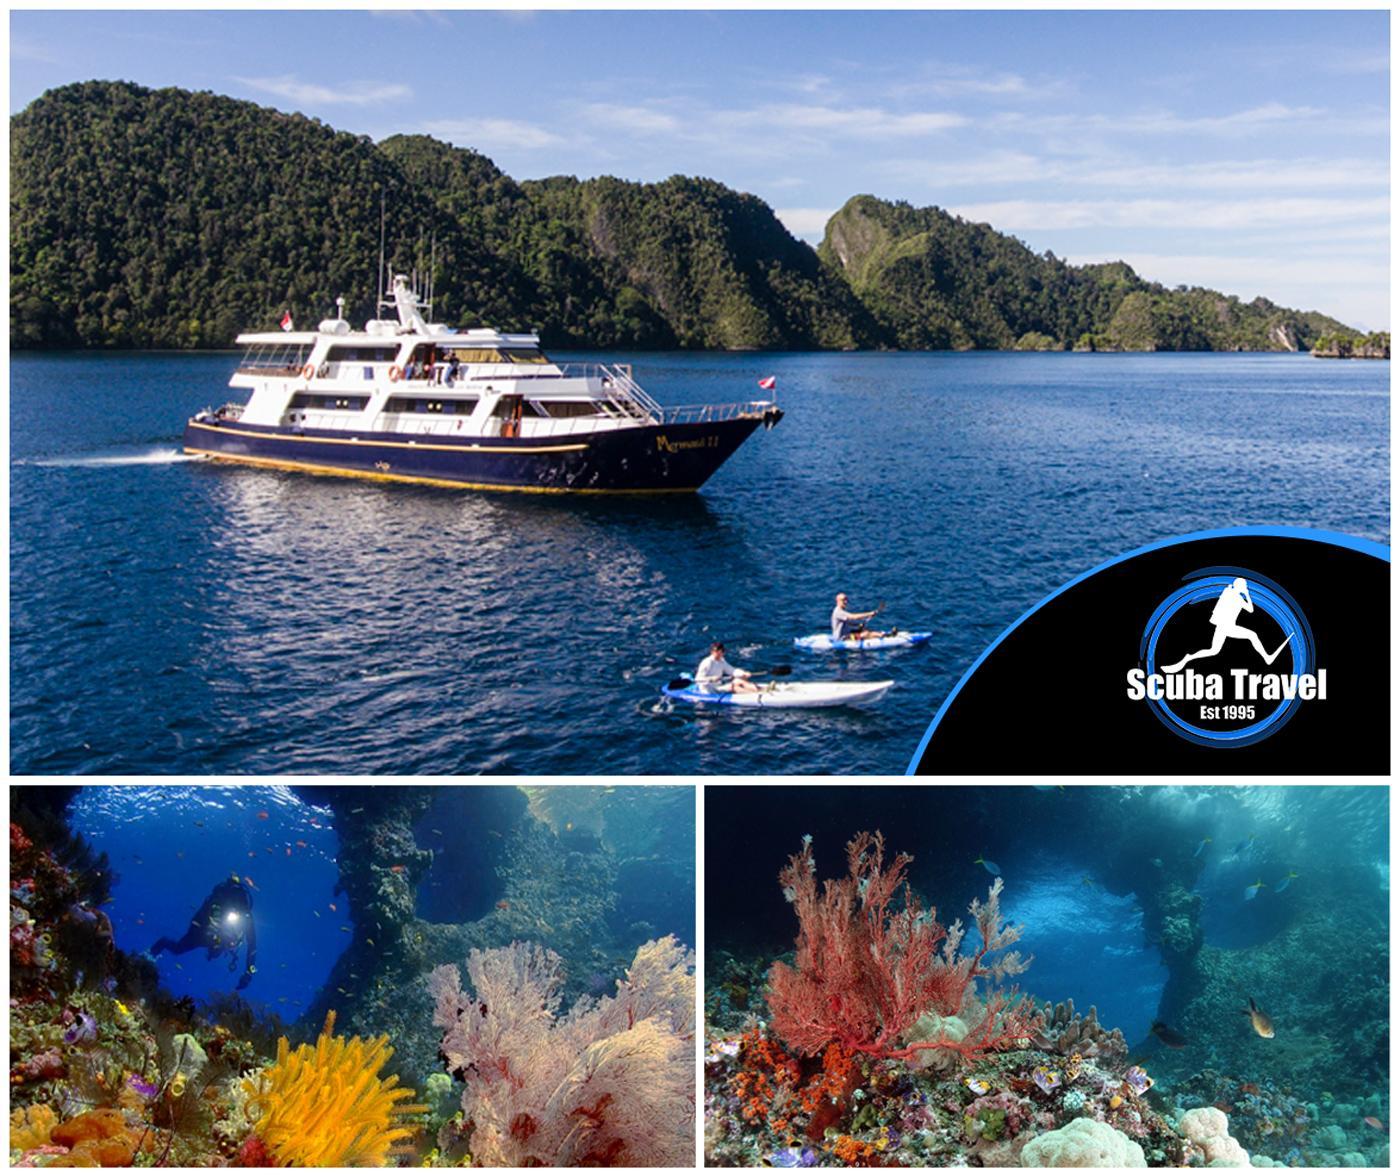 Scuba Travel, Indonesia, Mermaid2, Raja Ampat